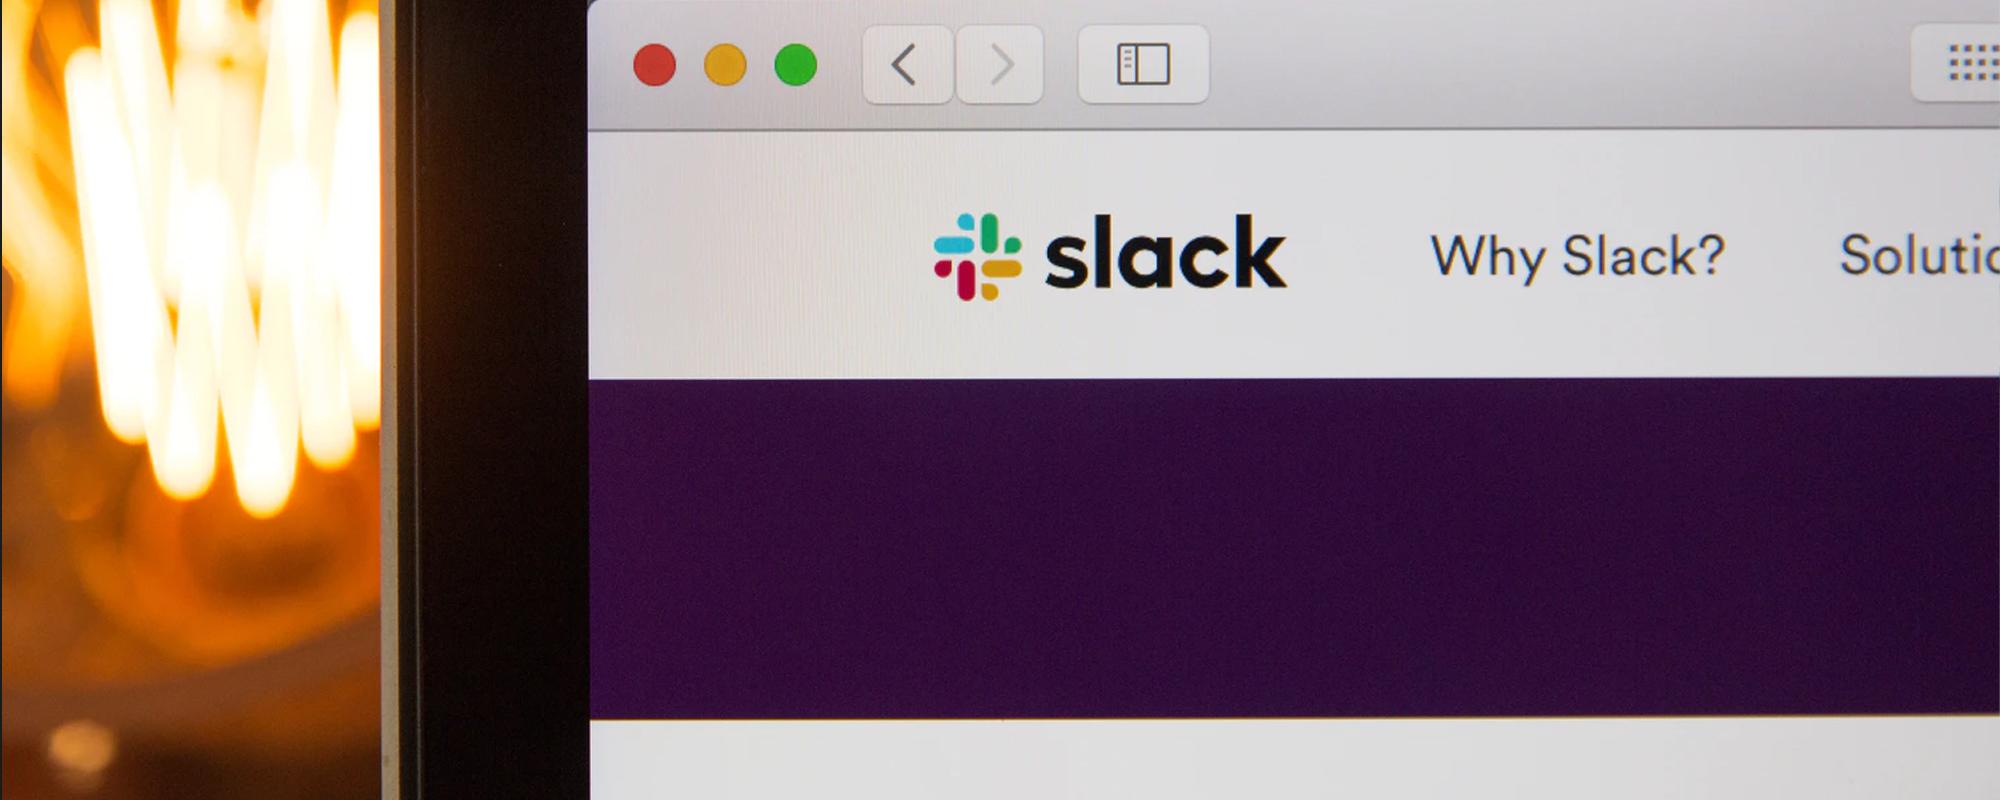 tips para usar slack de forma eficiente